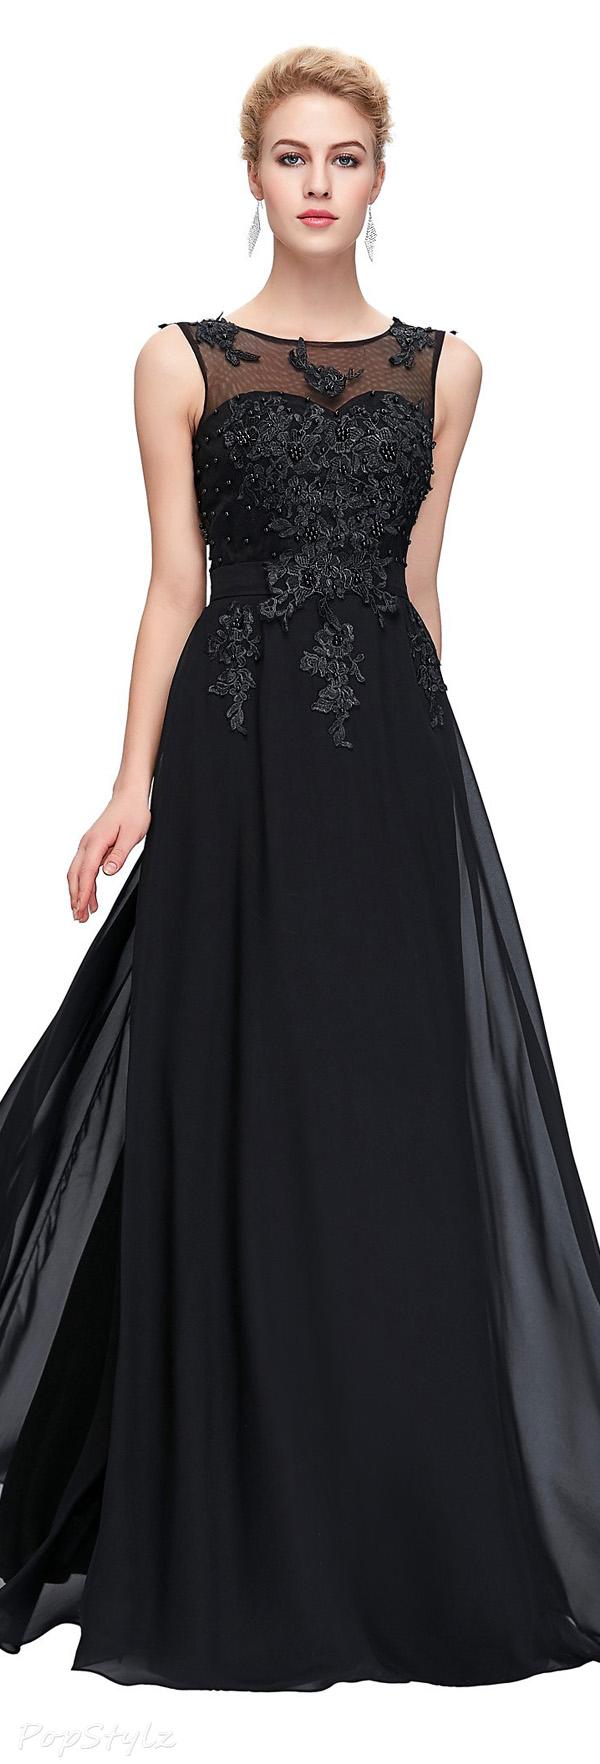 Grace Karin Beads & Applique Evening Gown